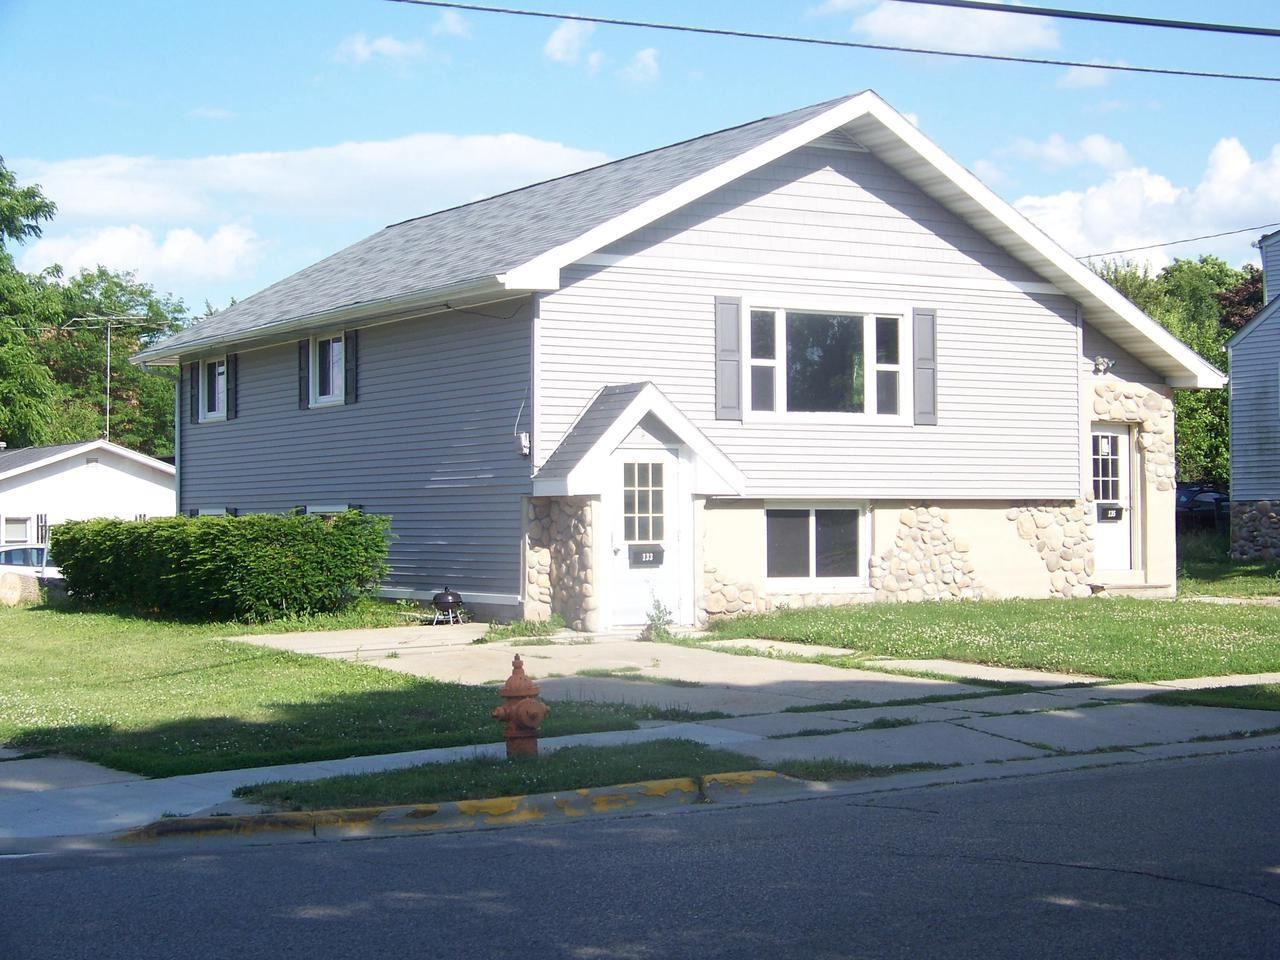 133 S Elizabeth St #135, Whitewater, WI 53190 - MLS#: 1679712